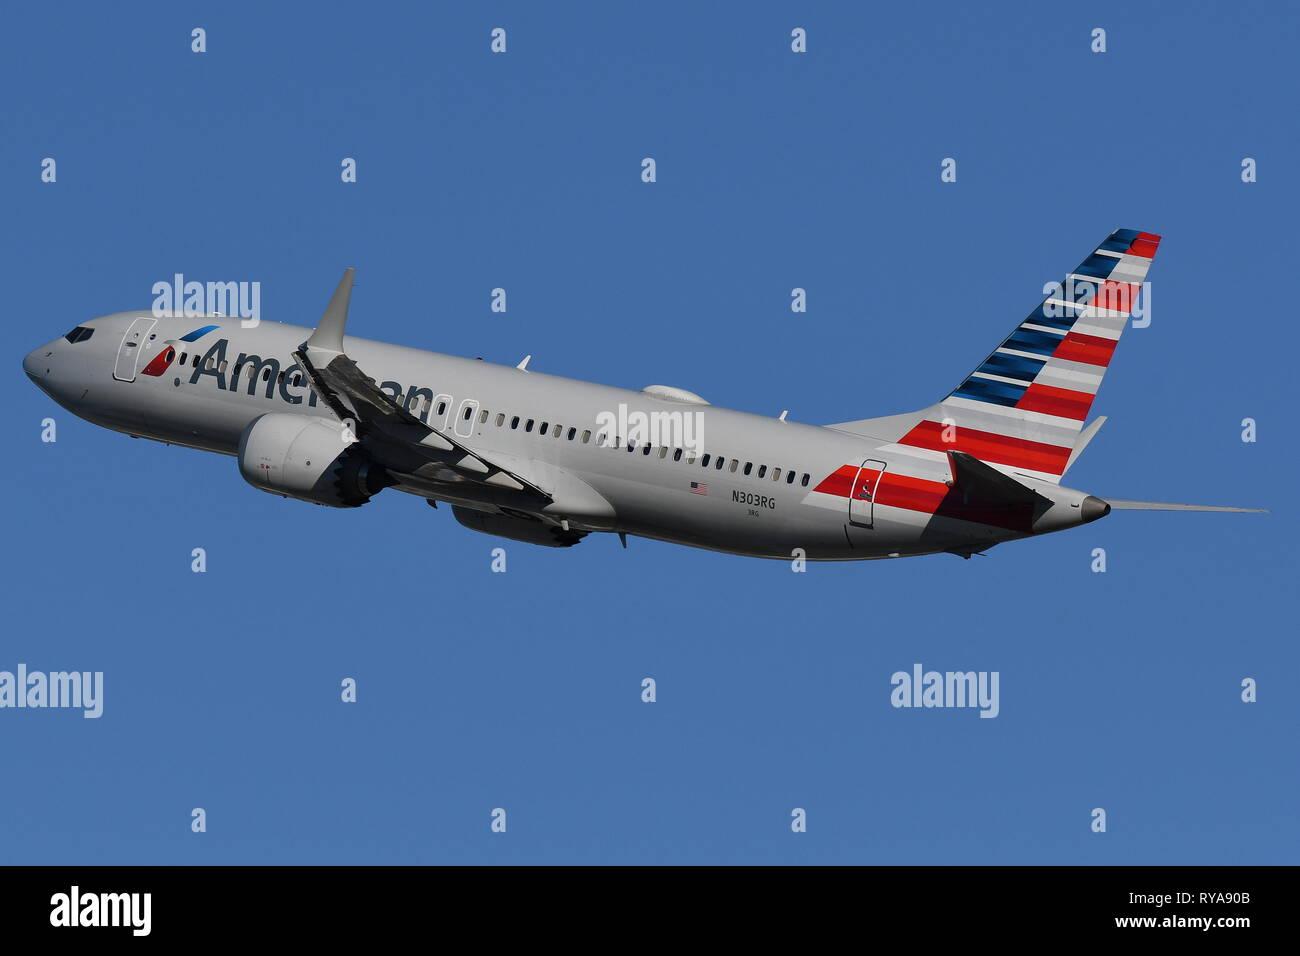 737 Max Stock Photos & 737 Max Stock Images - Alamy